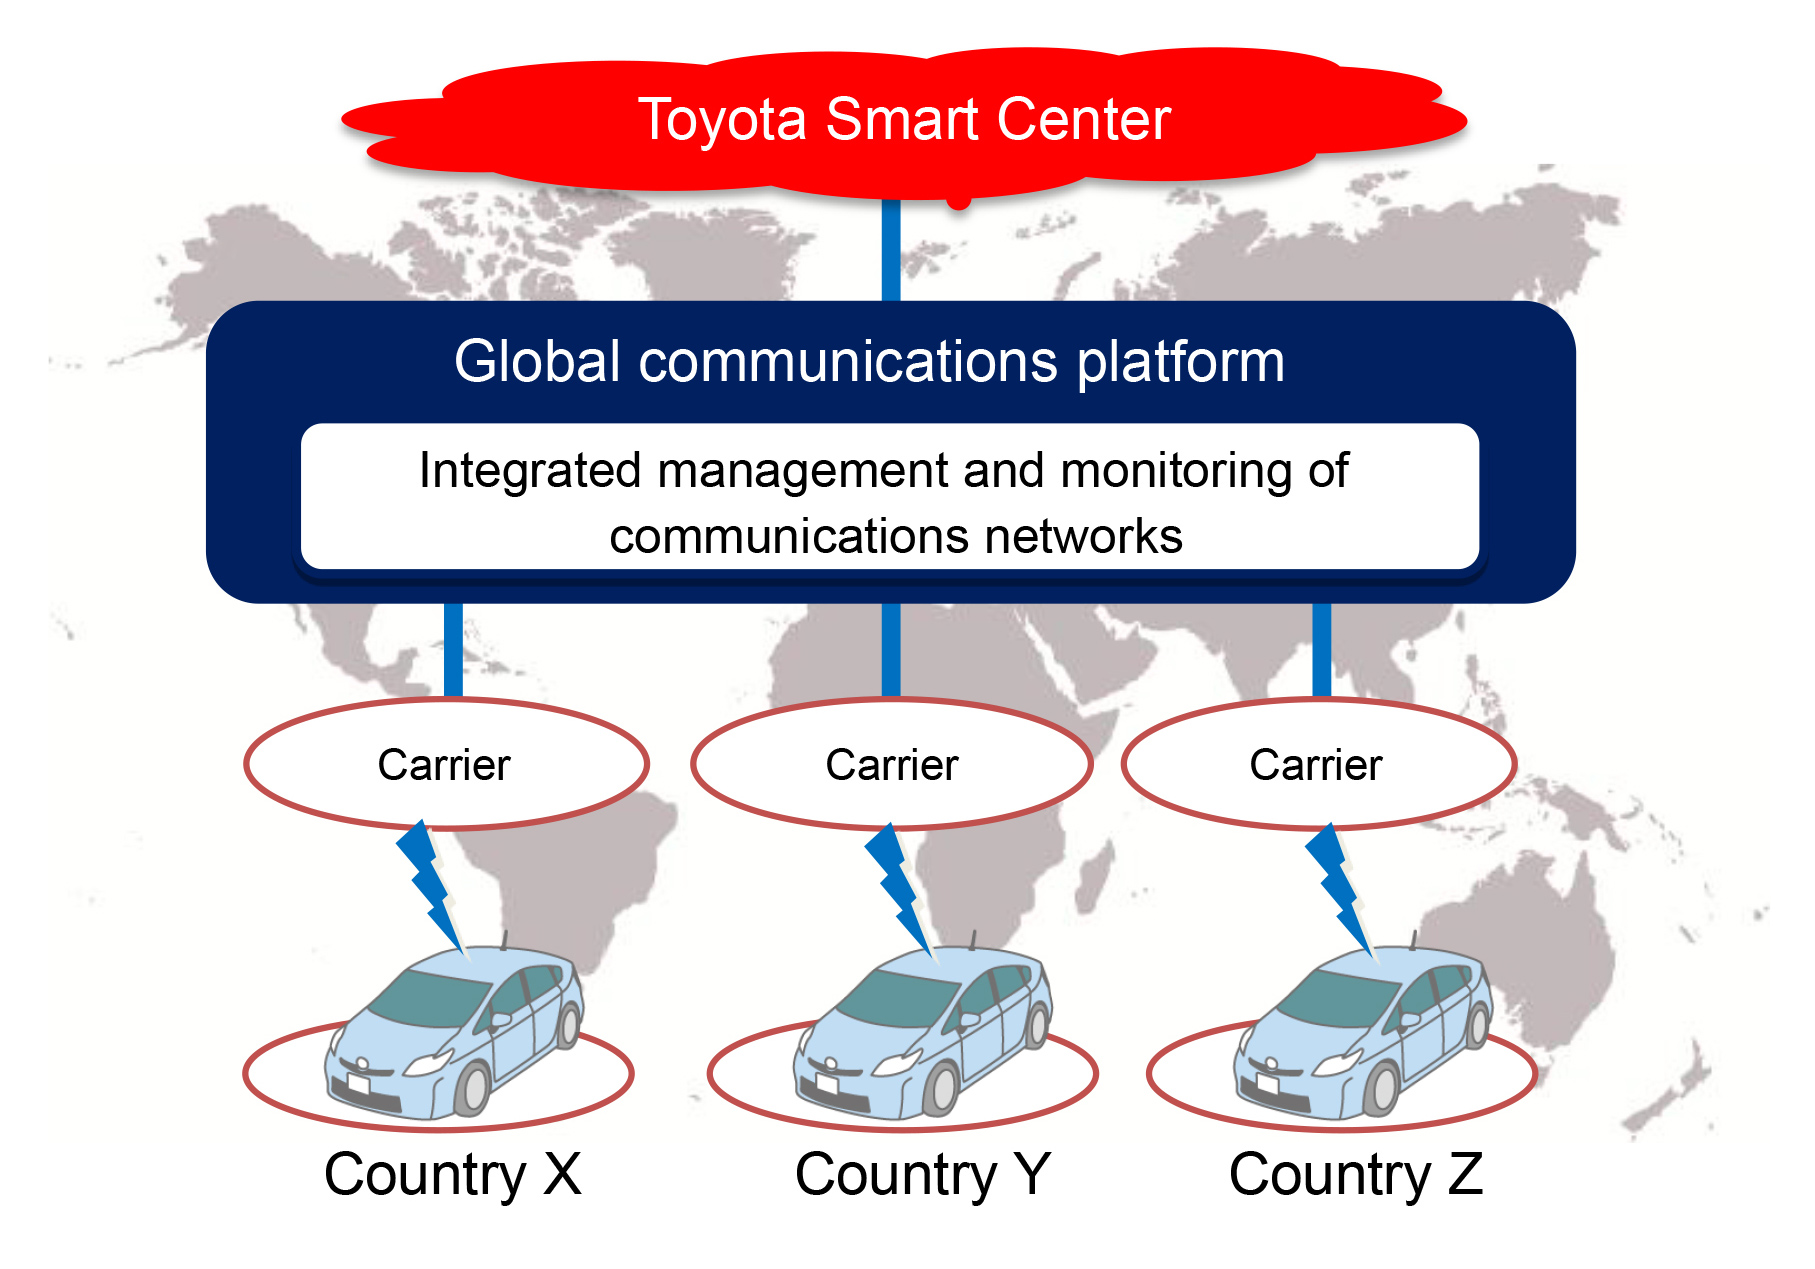 Toyota partners with KDDI to develop global connectivity platform for autonomous vehicles